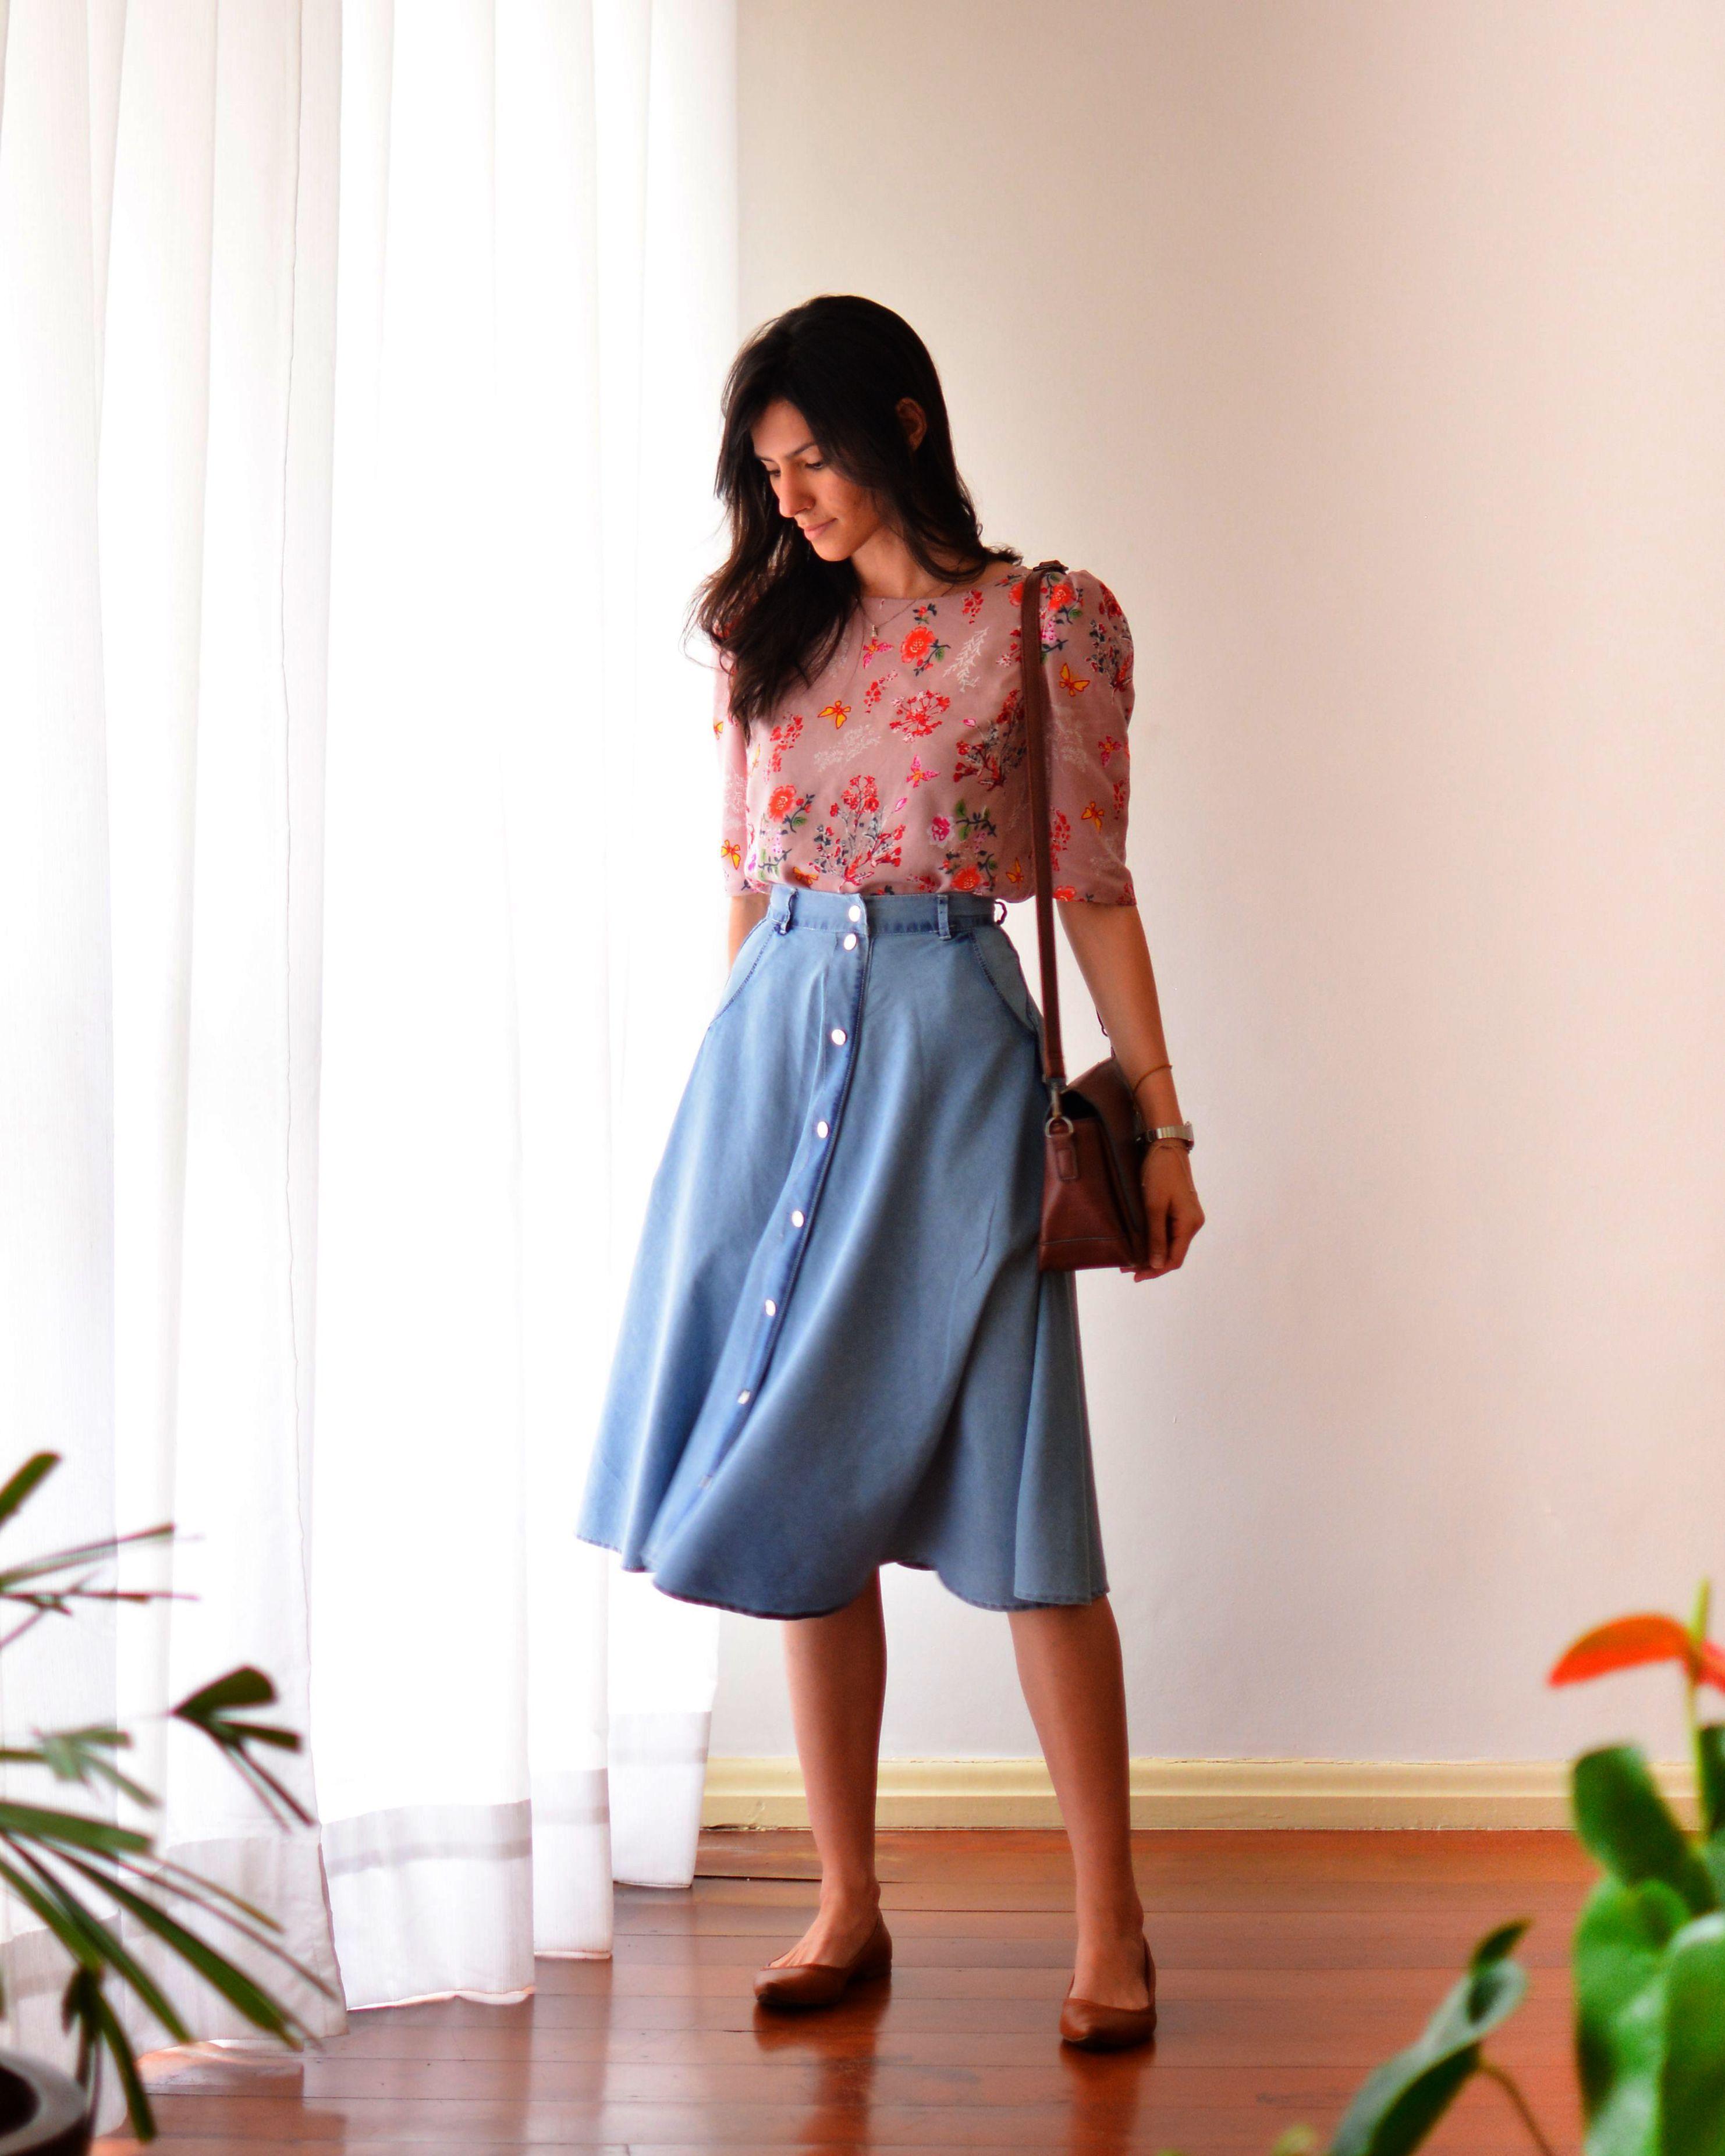 Lark Ro Womens Shoulder Sleeveless Cute Skirt Outfits Modest Outfits Modesty Dress